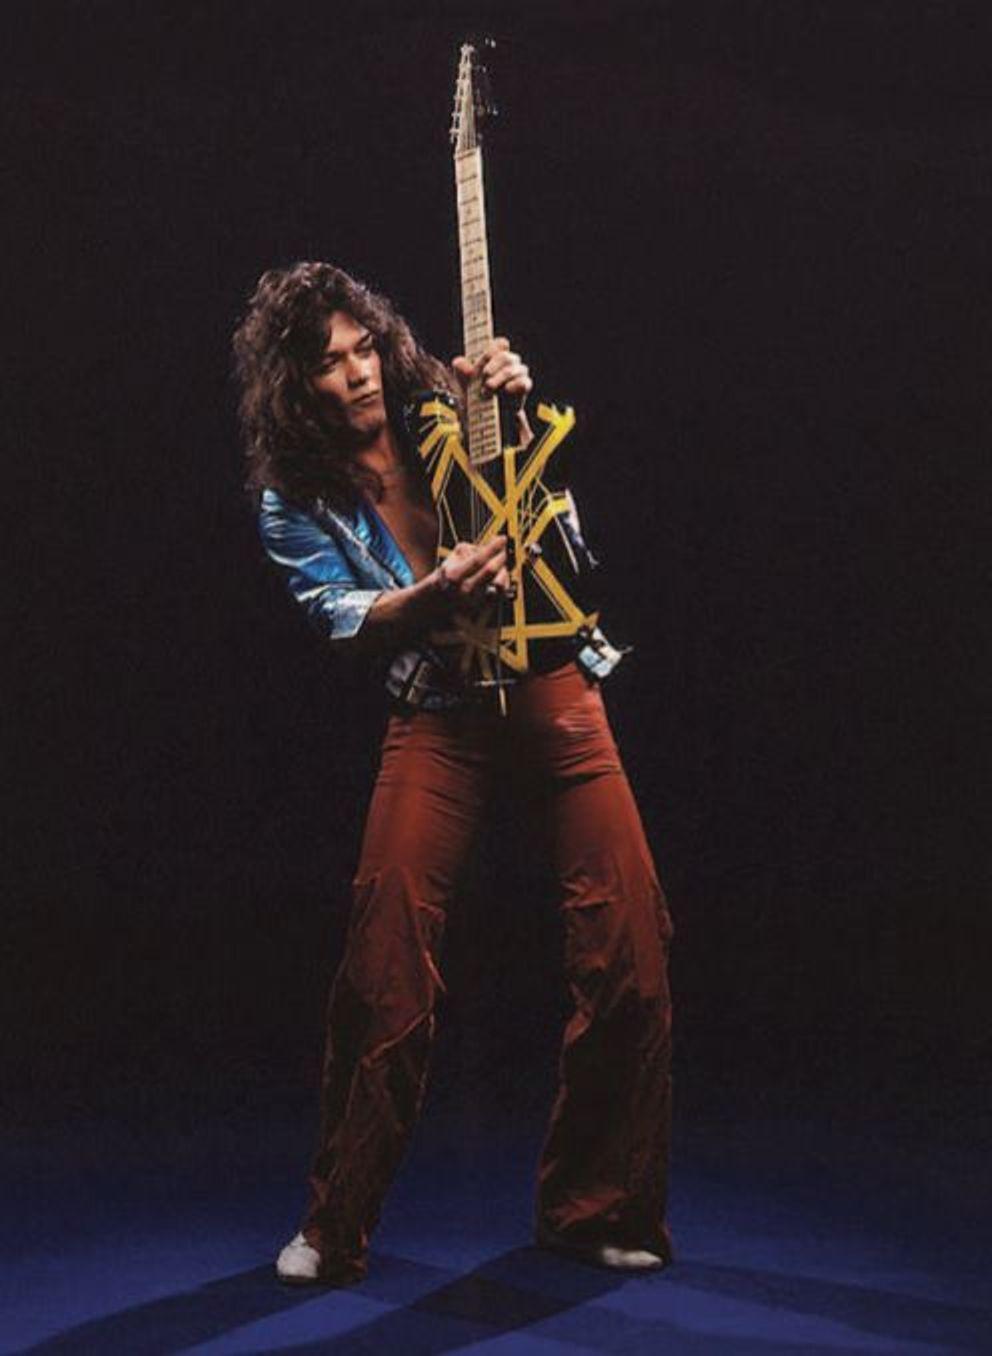 Edward Van Halen By Neil Zlozower 1979 Eddie Van Halen Van Halen Van Halen 5150